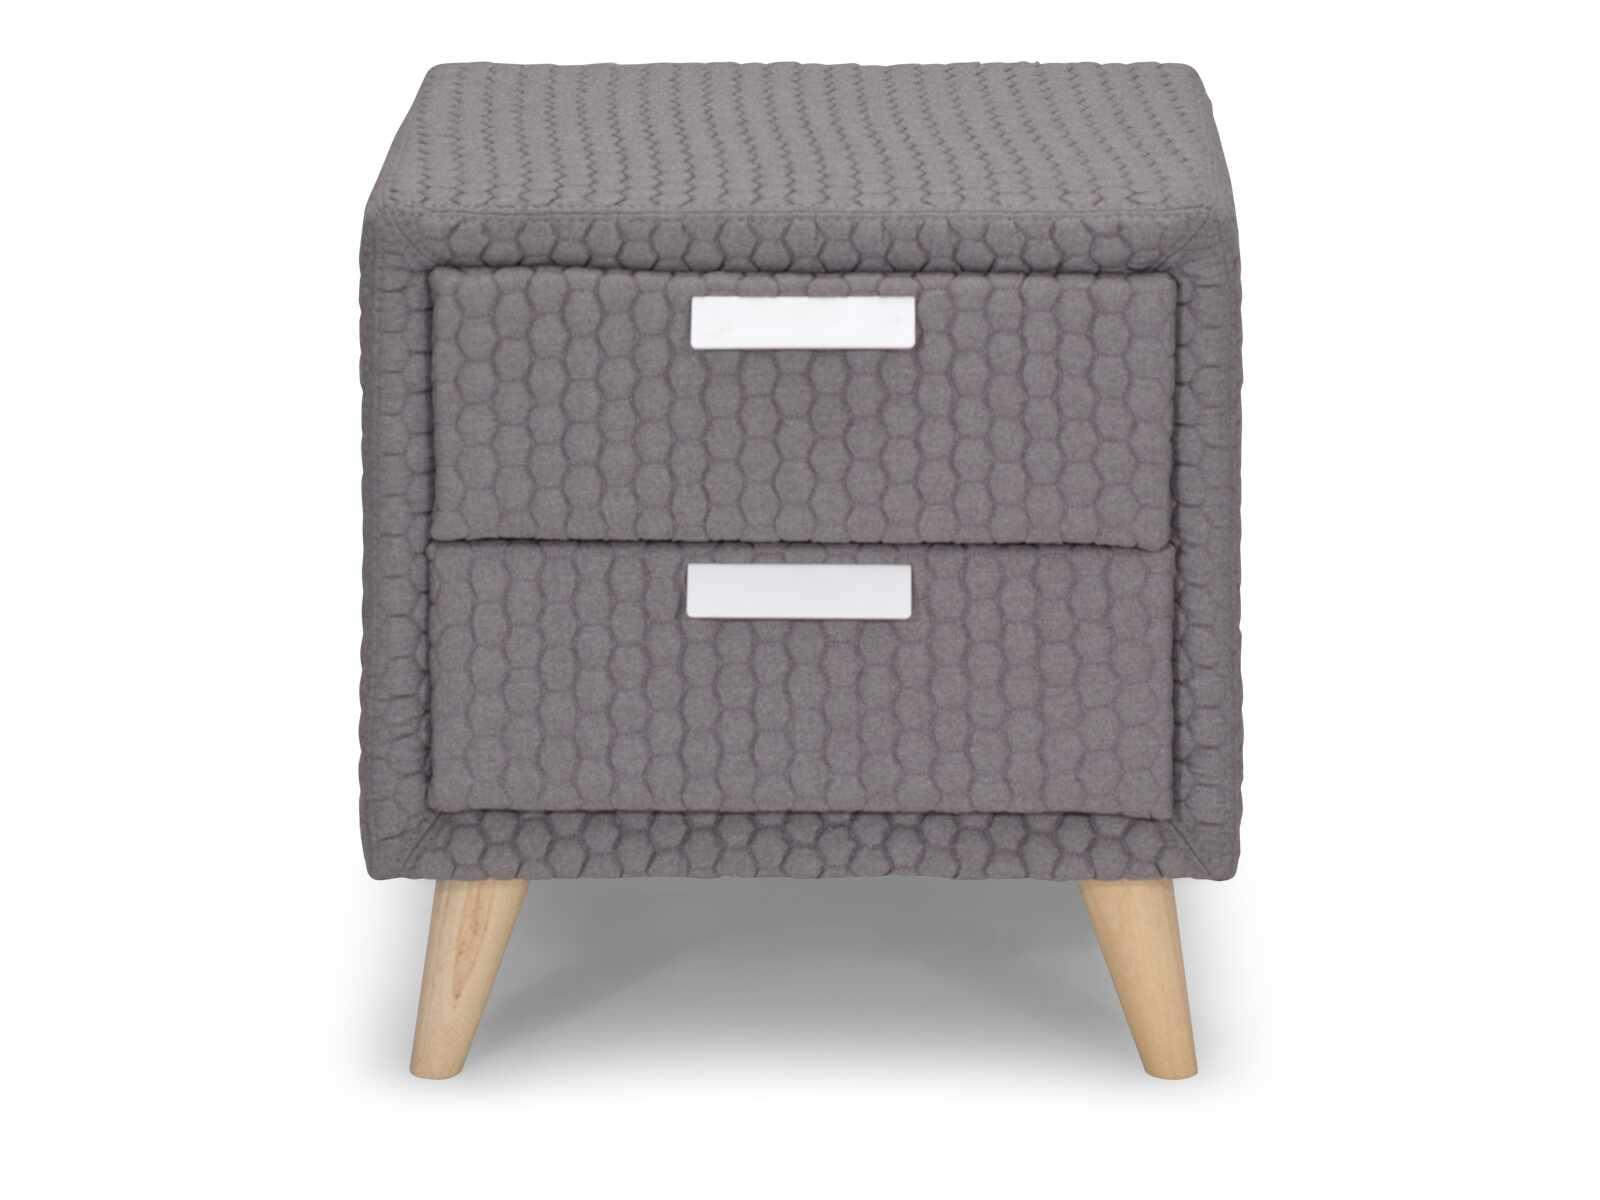 Noptiera cu 2 sertare tapitata cu stofa Astrid Grey, l50xA40,5xH53 cm la pret 558 lei